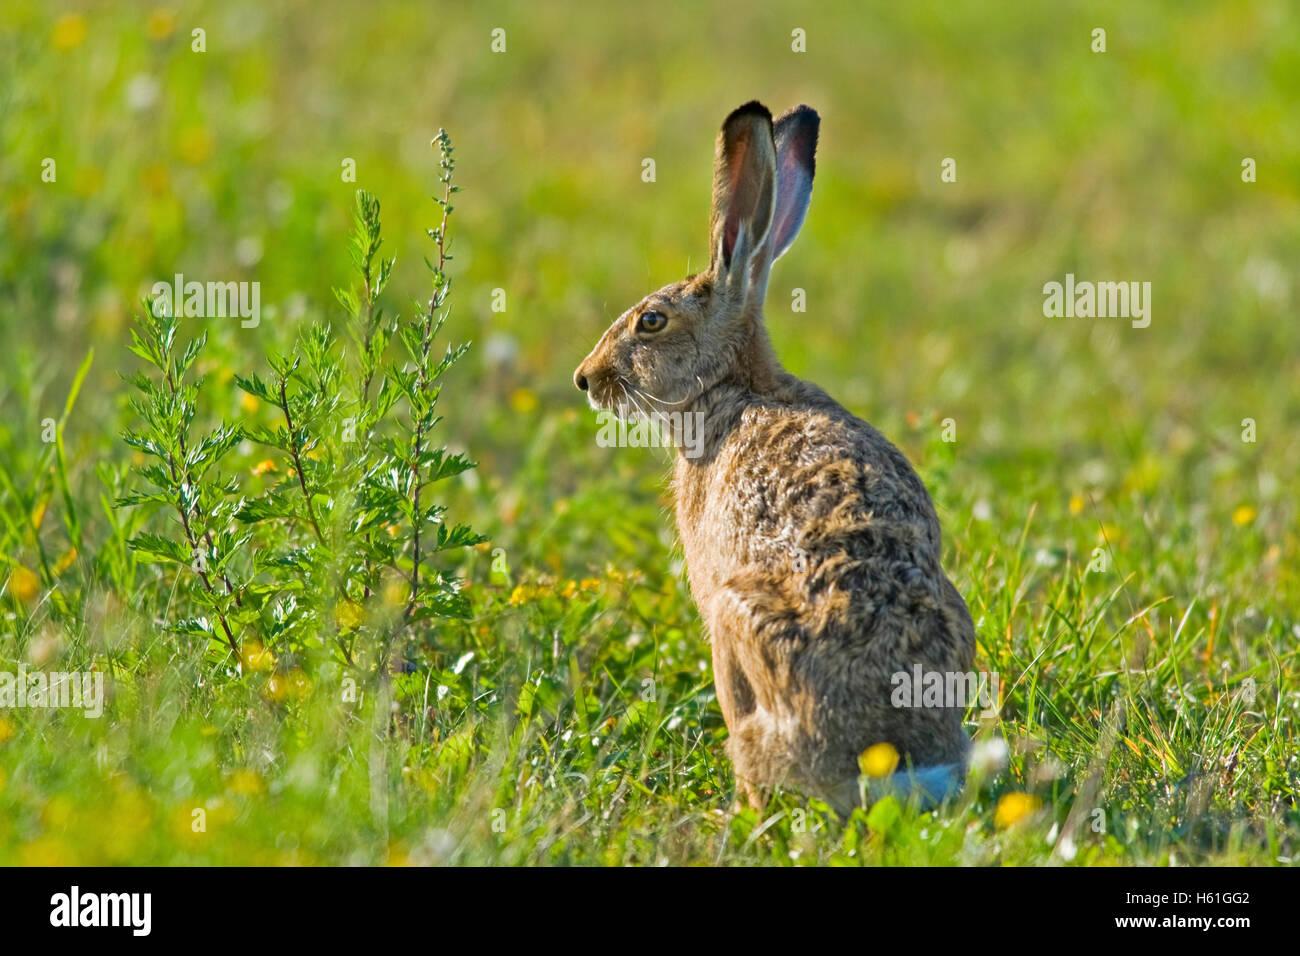 Hare (Lepus europaeus), Apetlon, Burgenland, Austria, Europe - Stock Image